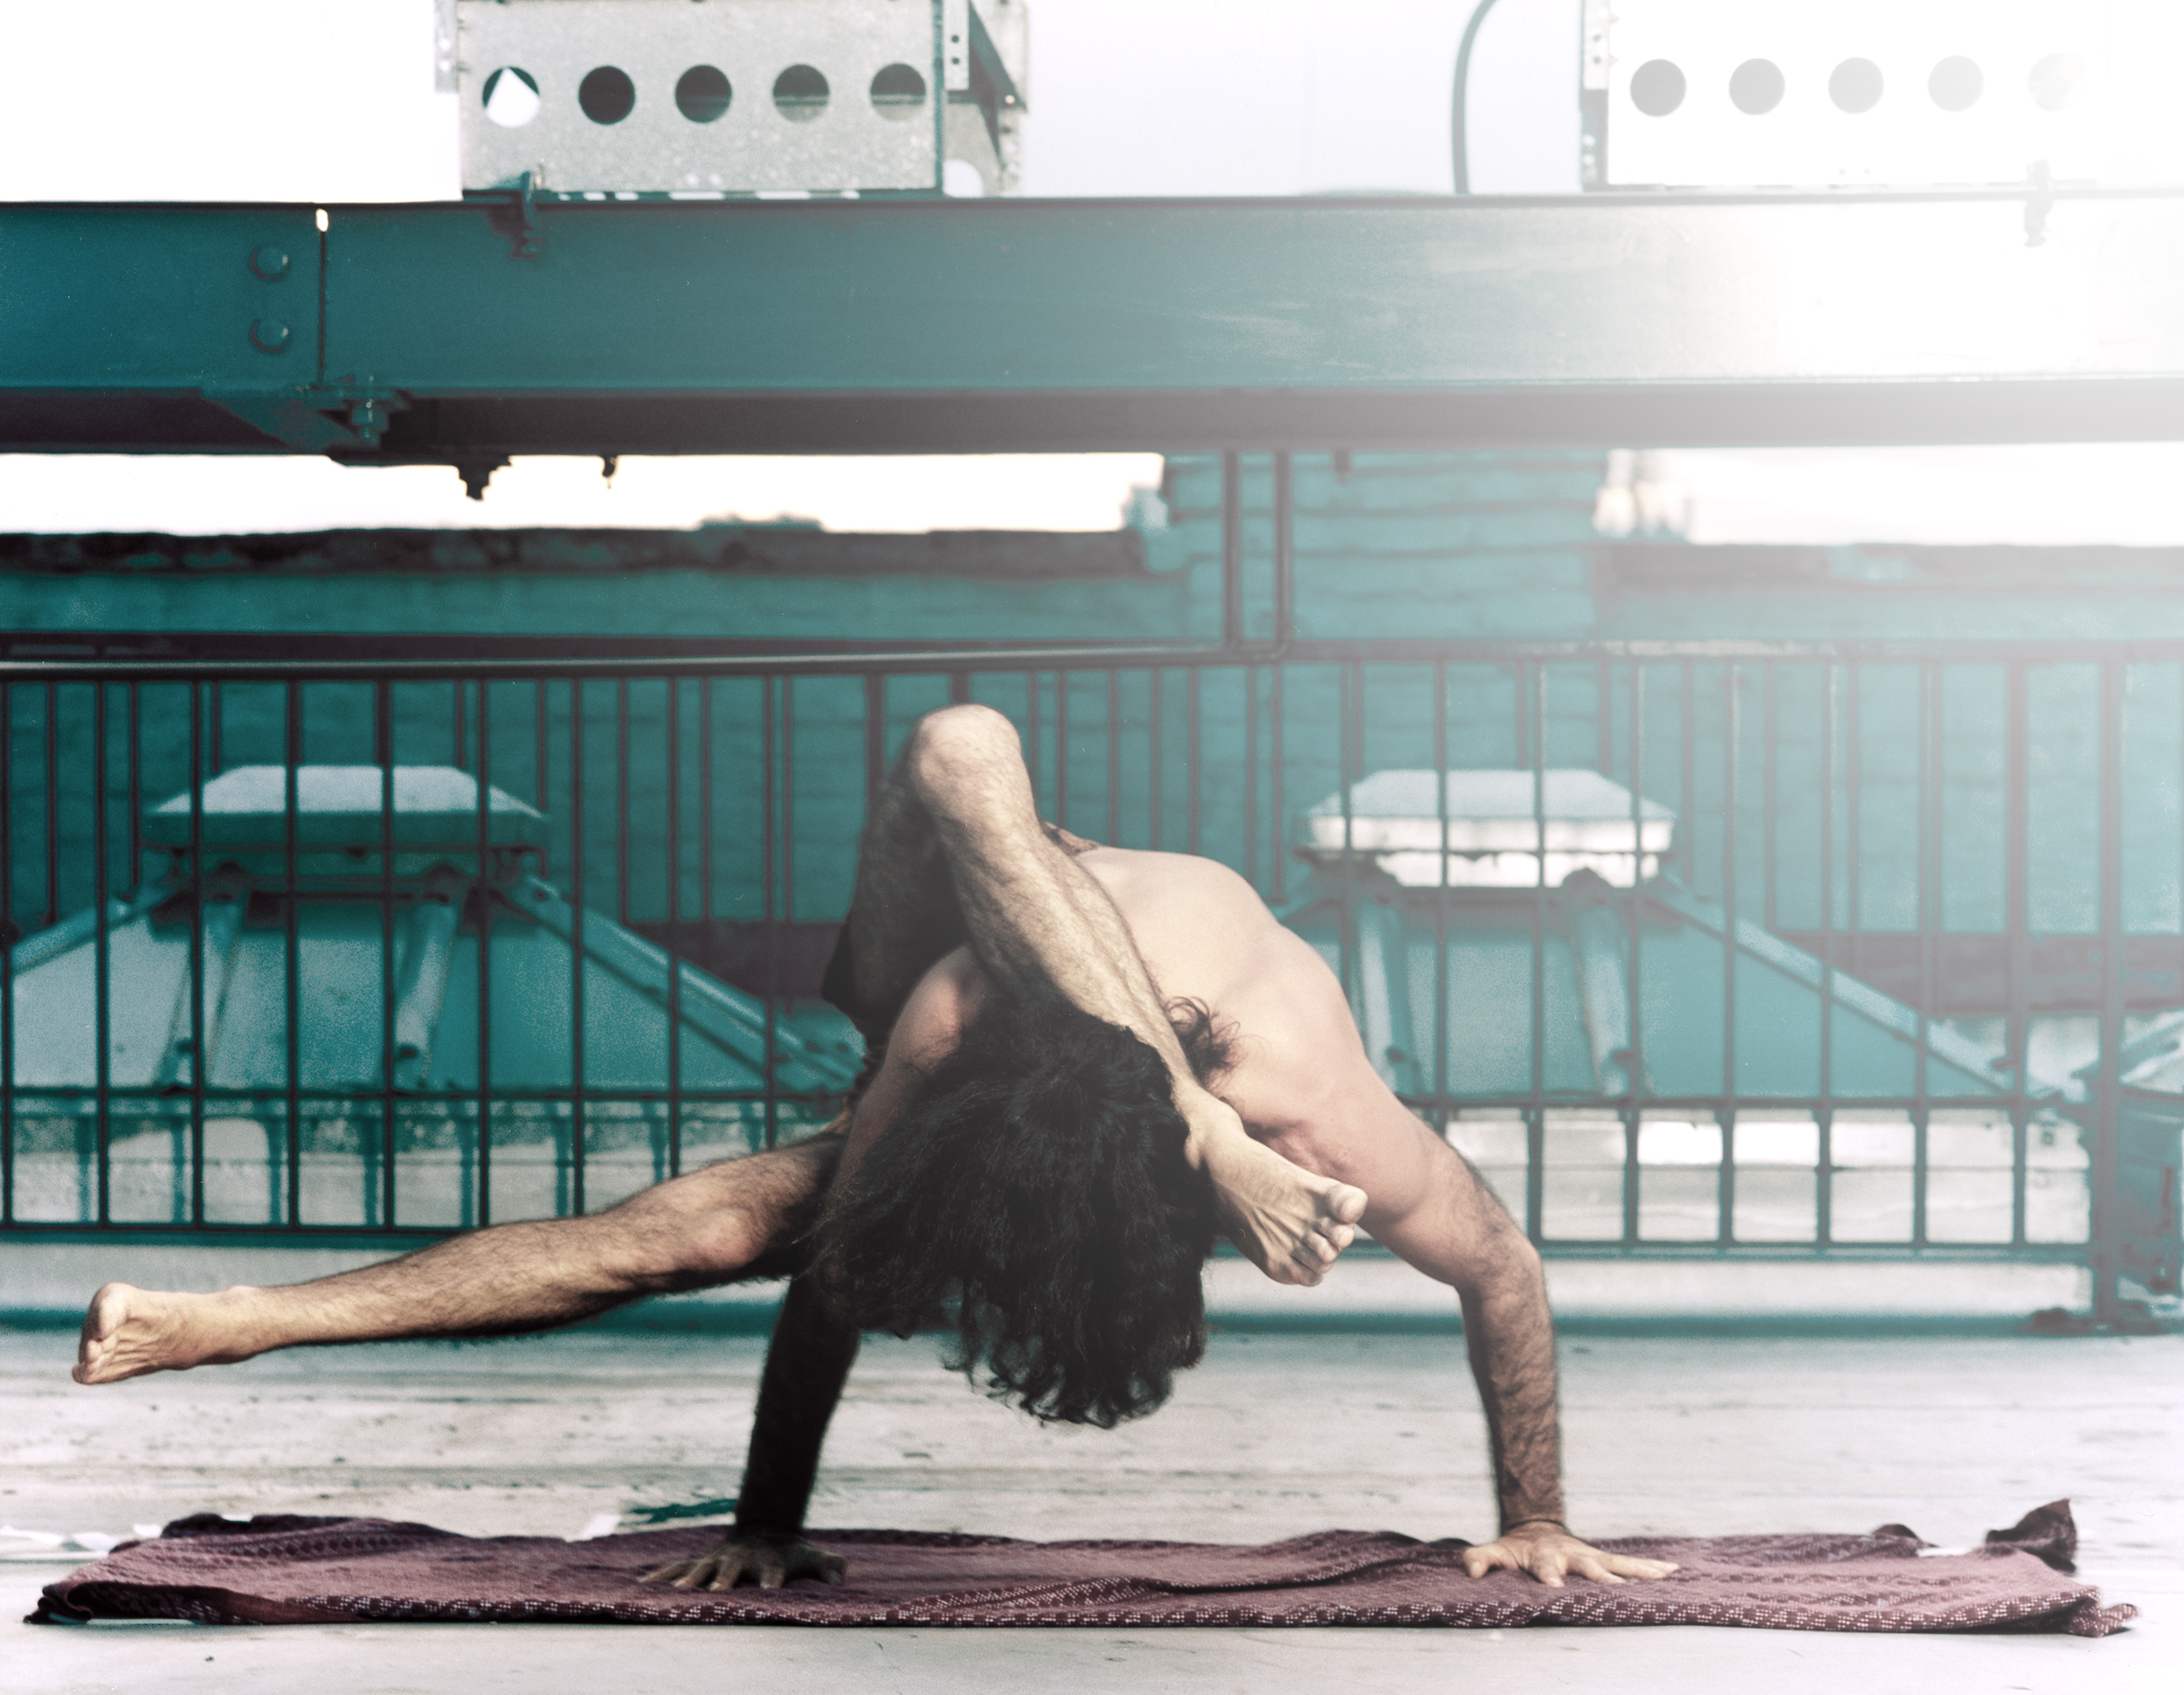 Utthita Eka Pada Koundinya Sirsasana. Danny Paradise New York 1999 Ashtanga Yoga photo by Kia Naddermier